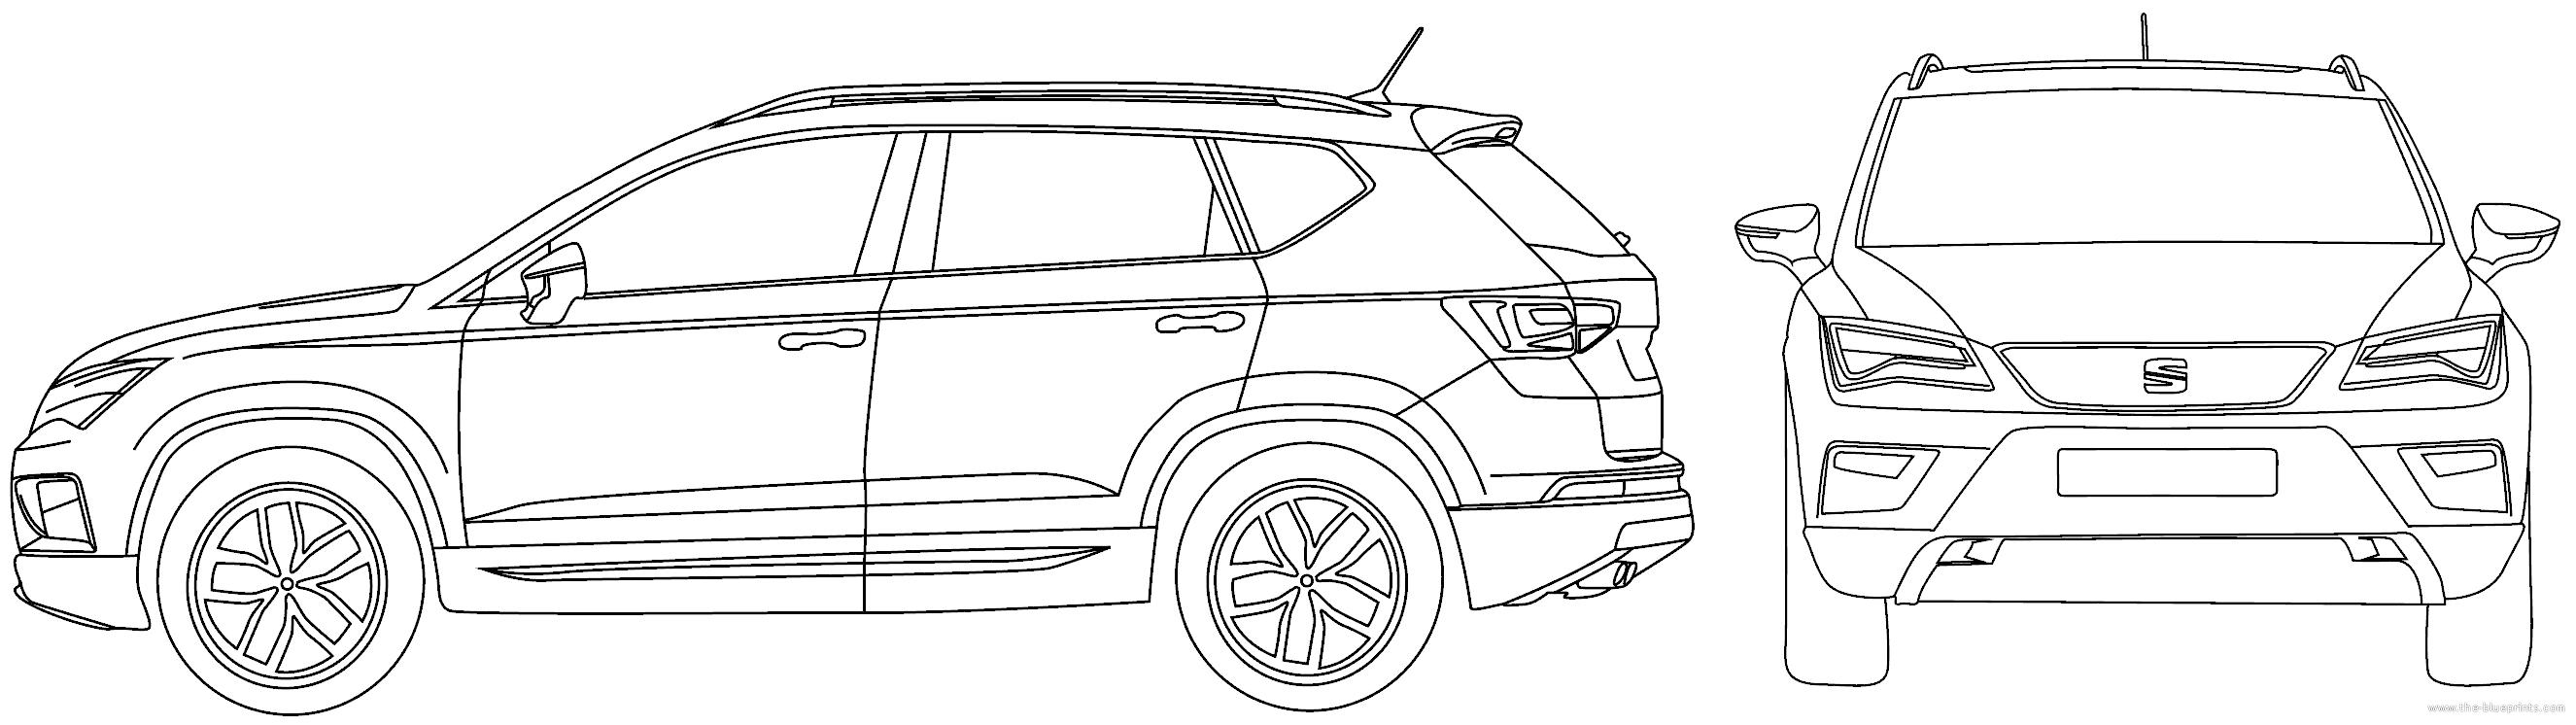 Blueprints cars seat seat ateca 2016 seat ateca 2016 malvernweather Images